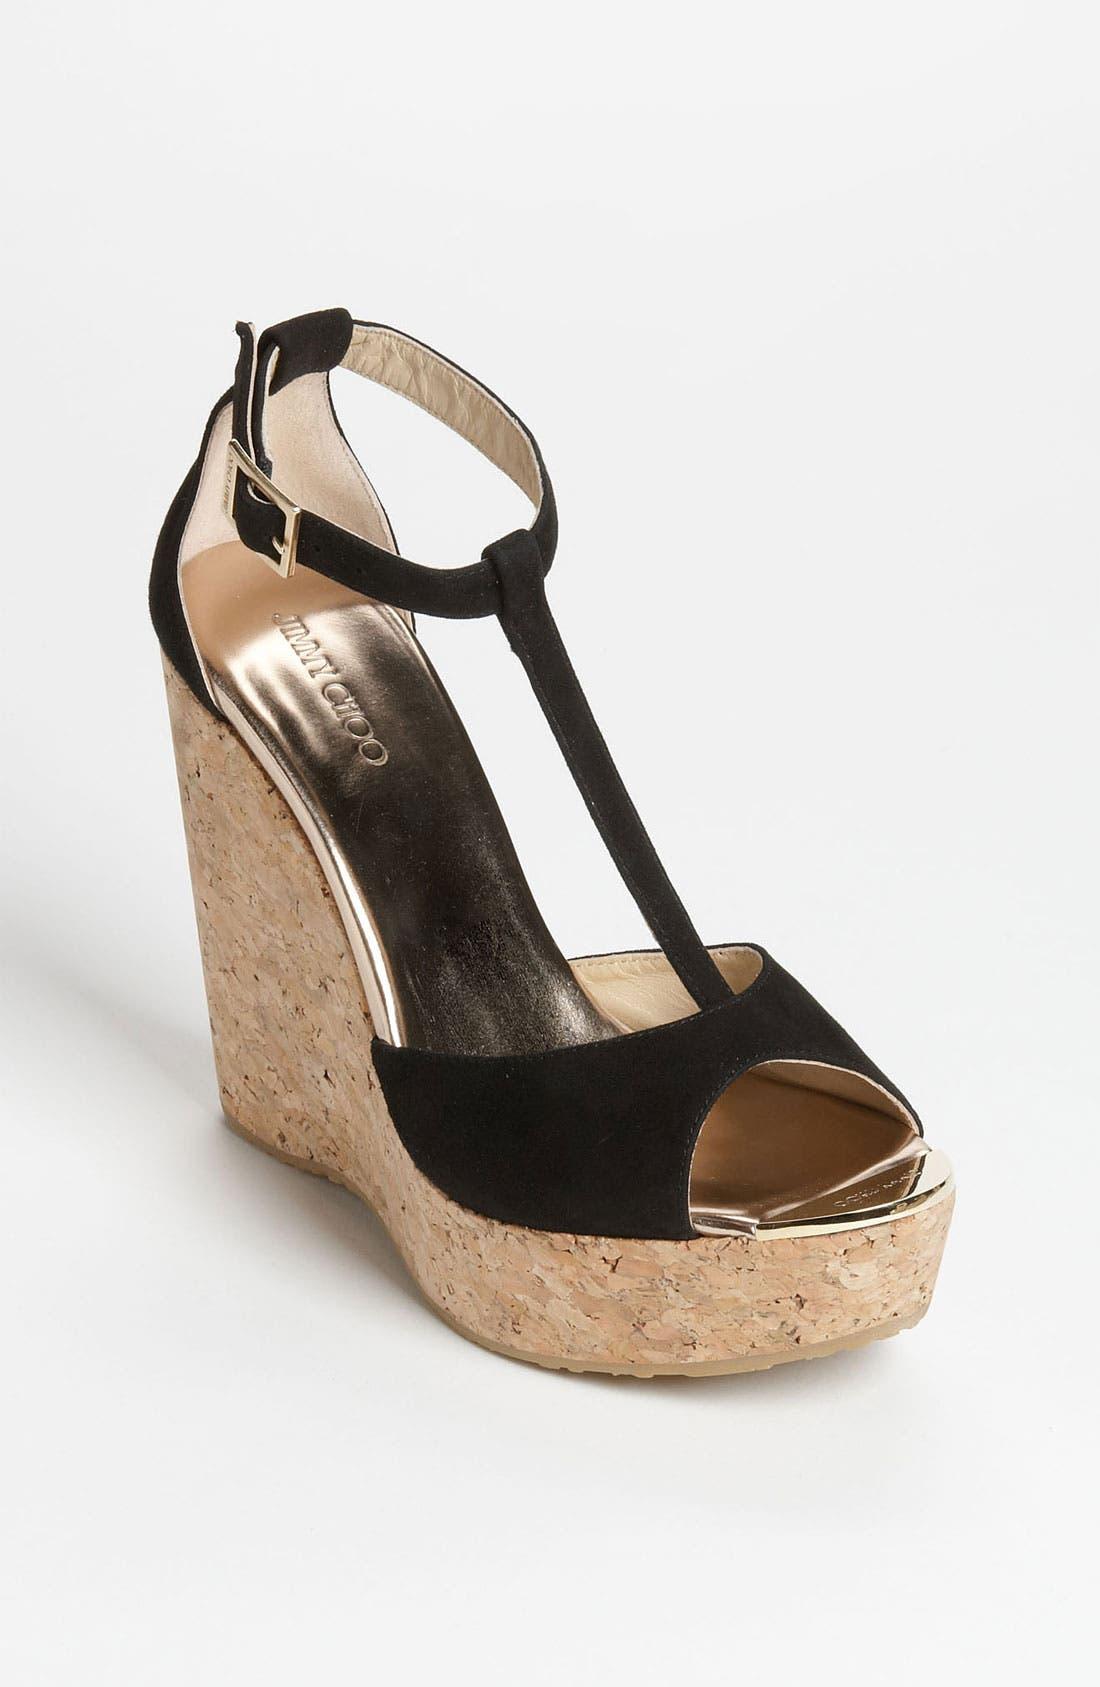 Alternate Image 1 Selected - Jimmy Choo 'Pela' Cork Sandal